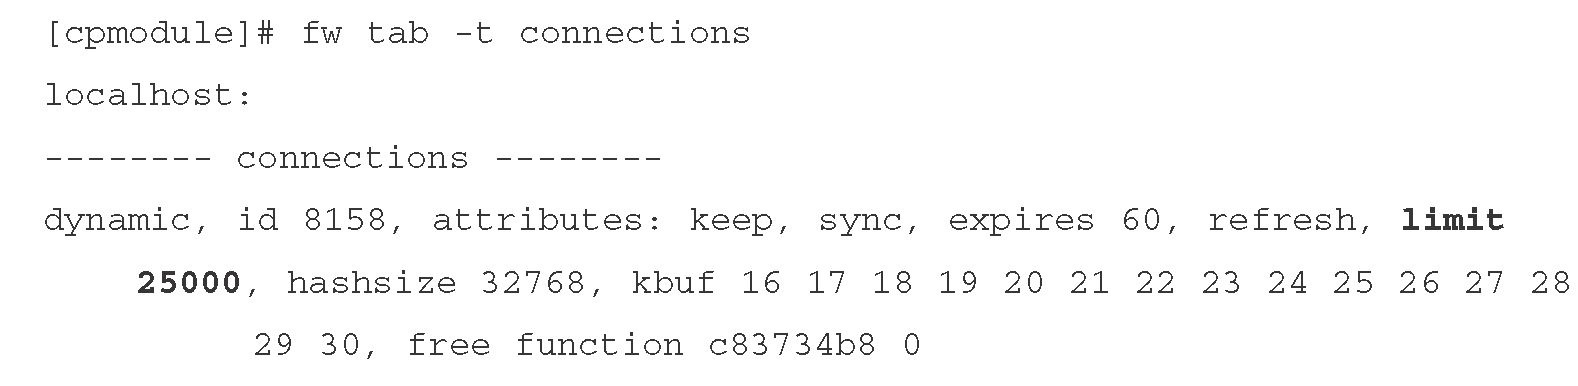 Adding Hardware to SecurePlatform (Check Point)